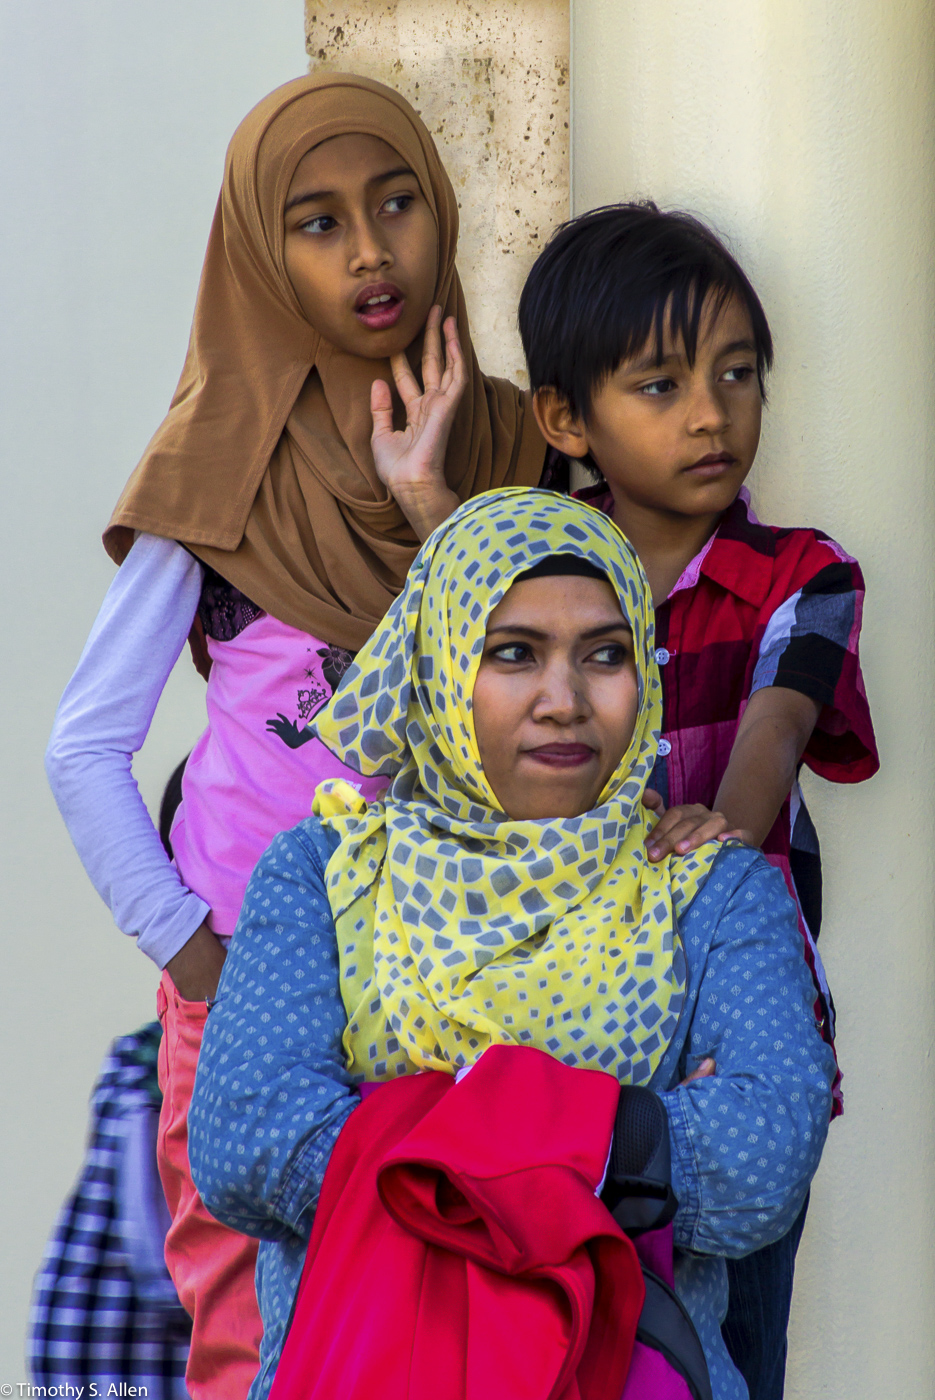 Malaysian Family Visiting Turkey December 6, 2015